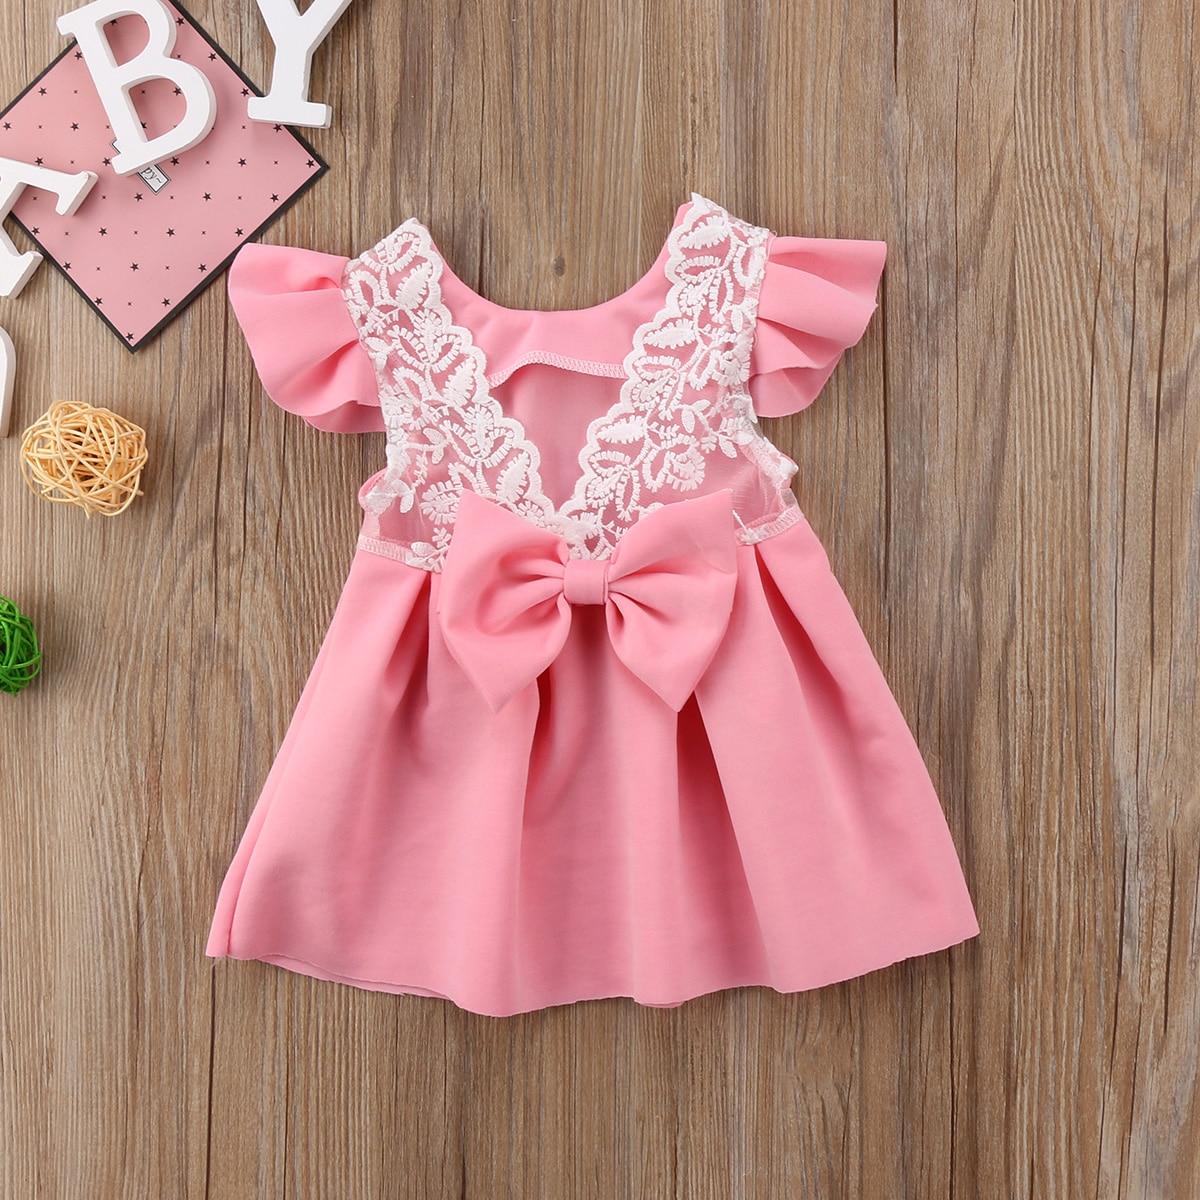 2cba5fb41cb43 Pudcoco Baby Girls Dress Toddler Girls Backless Lace Bow Princess Dresses  Tutu Party Wedding birthday Dress